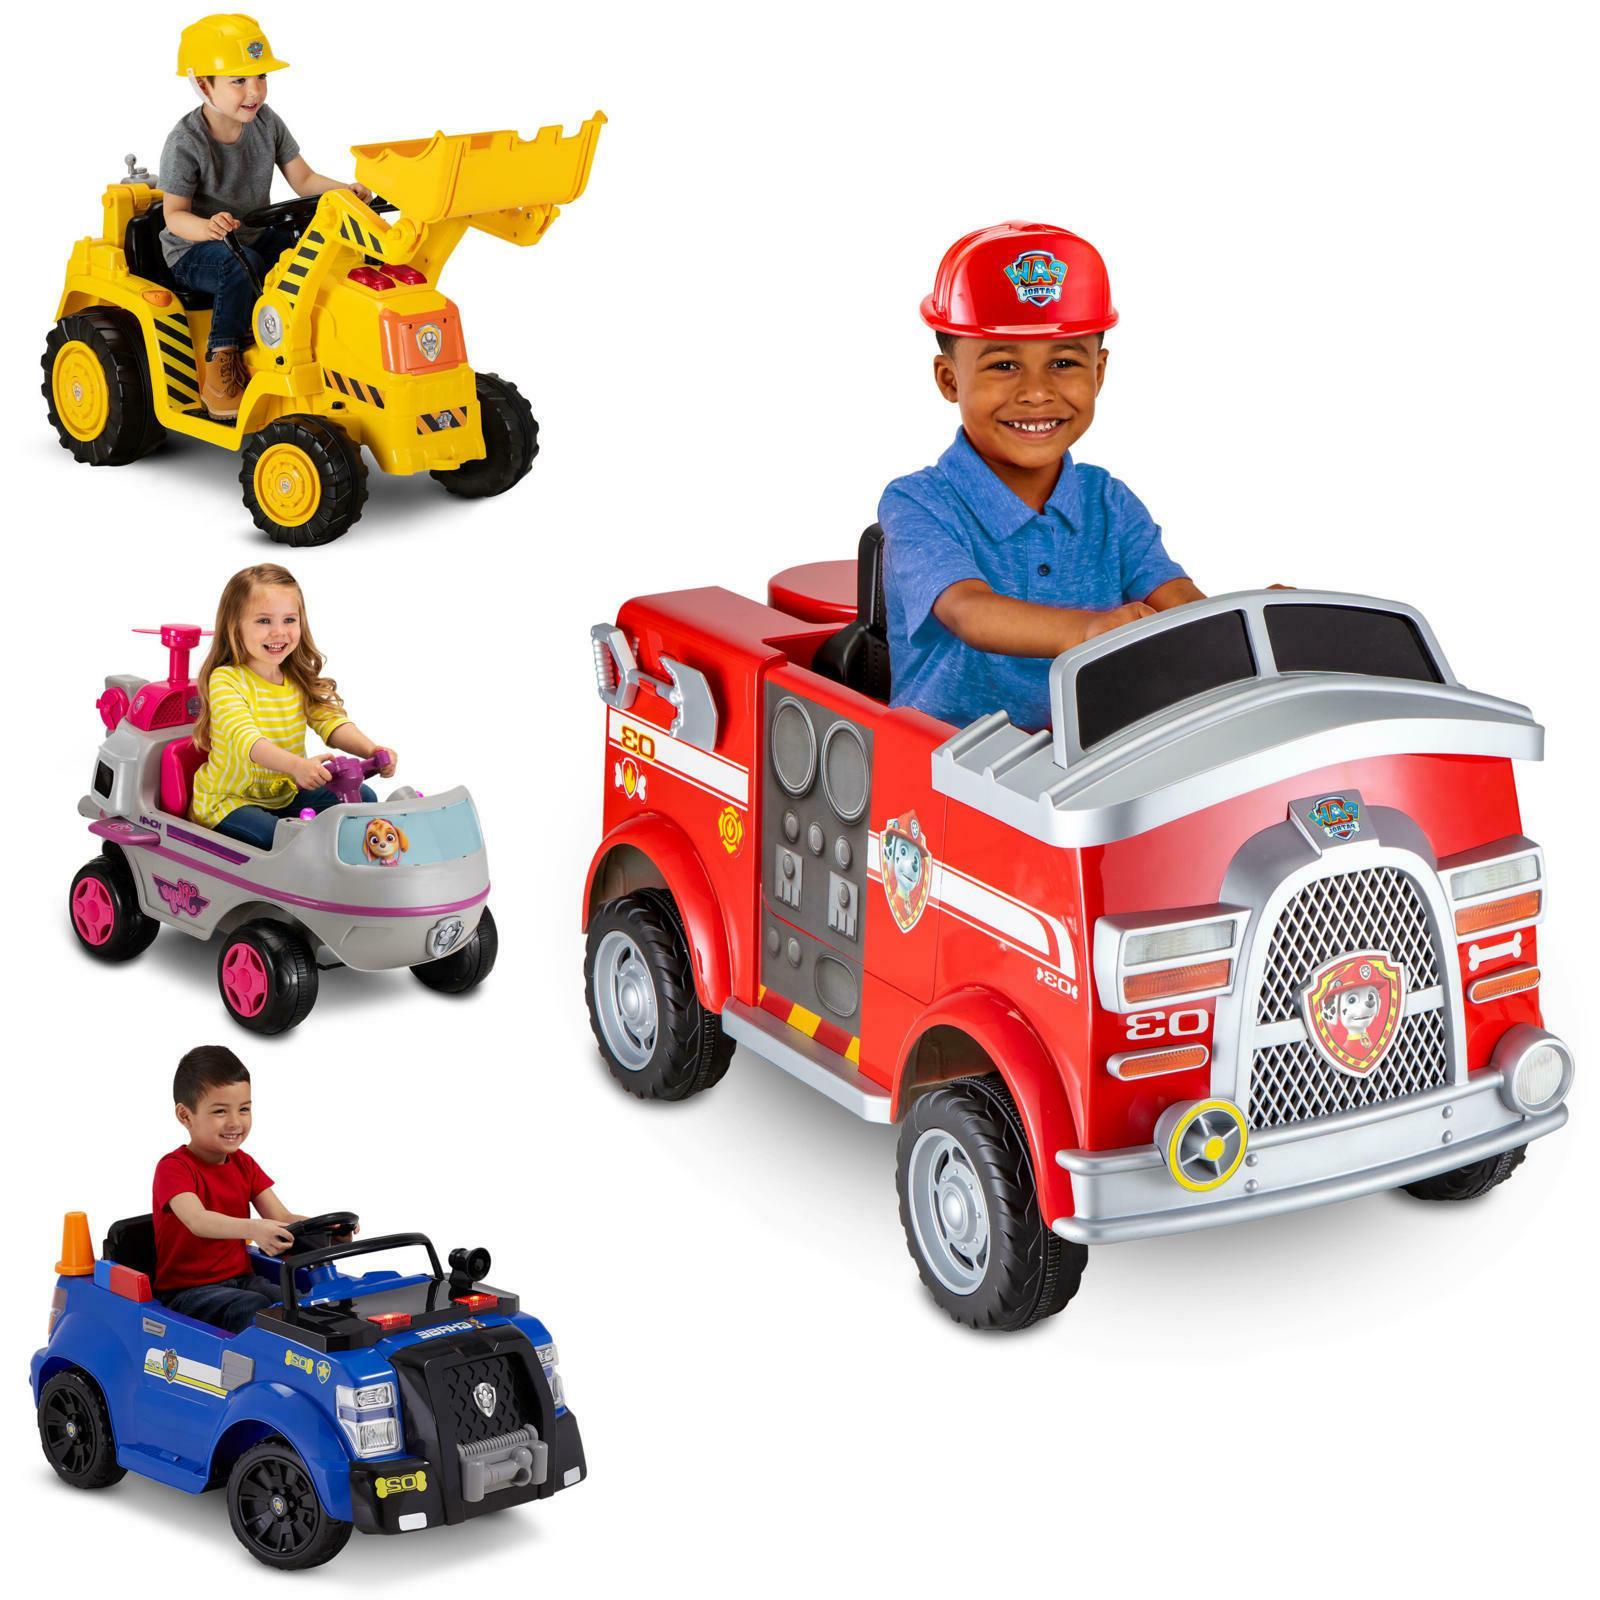 fire truck 6 volt powered ride on